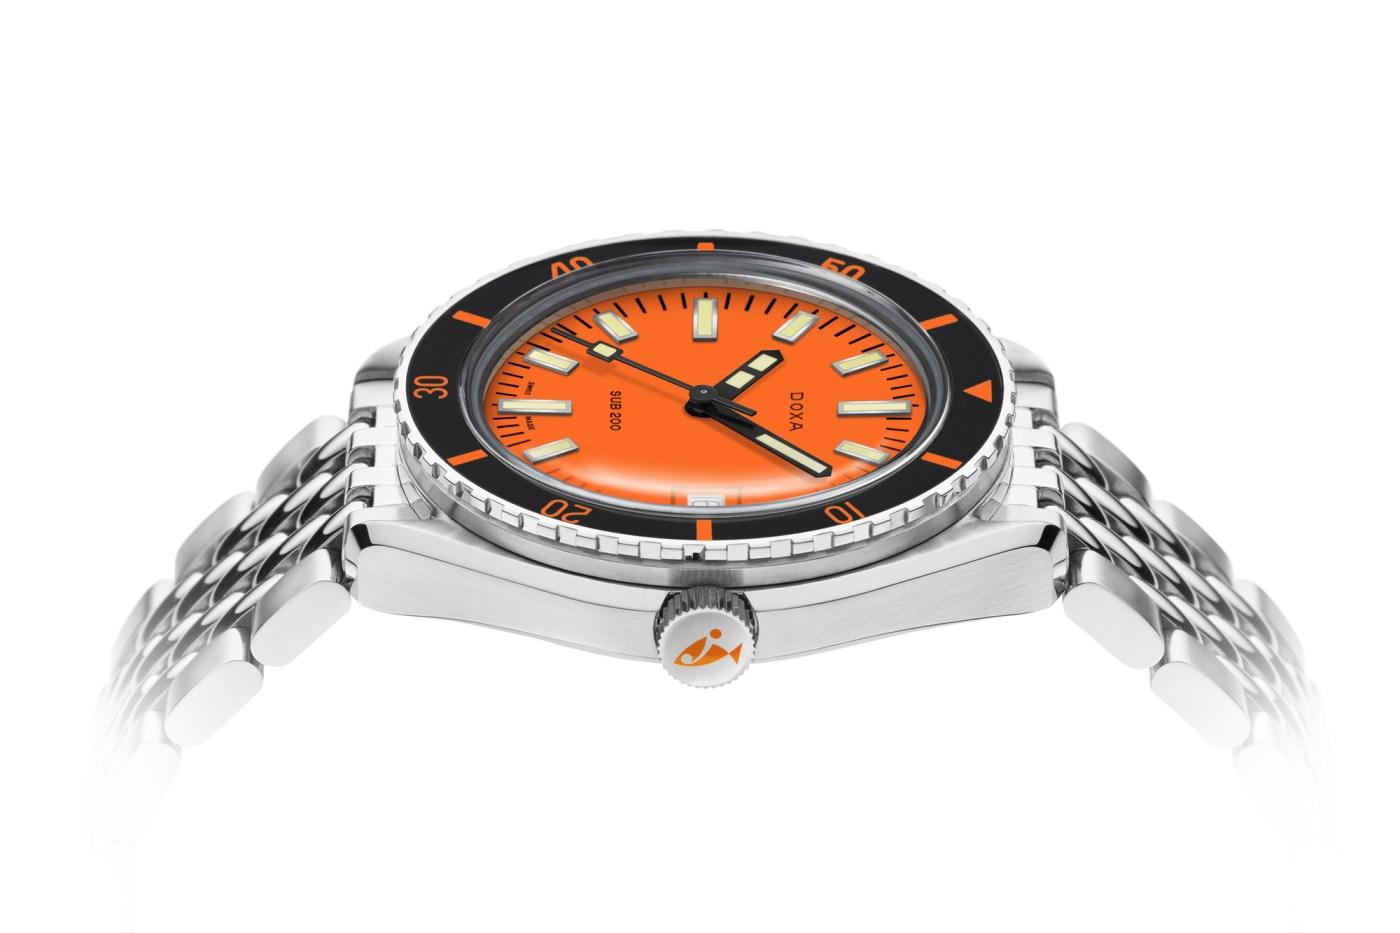 Doxa Sub 200 Orange dial